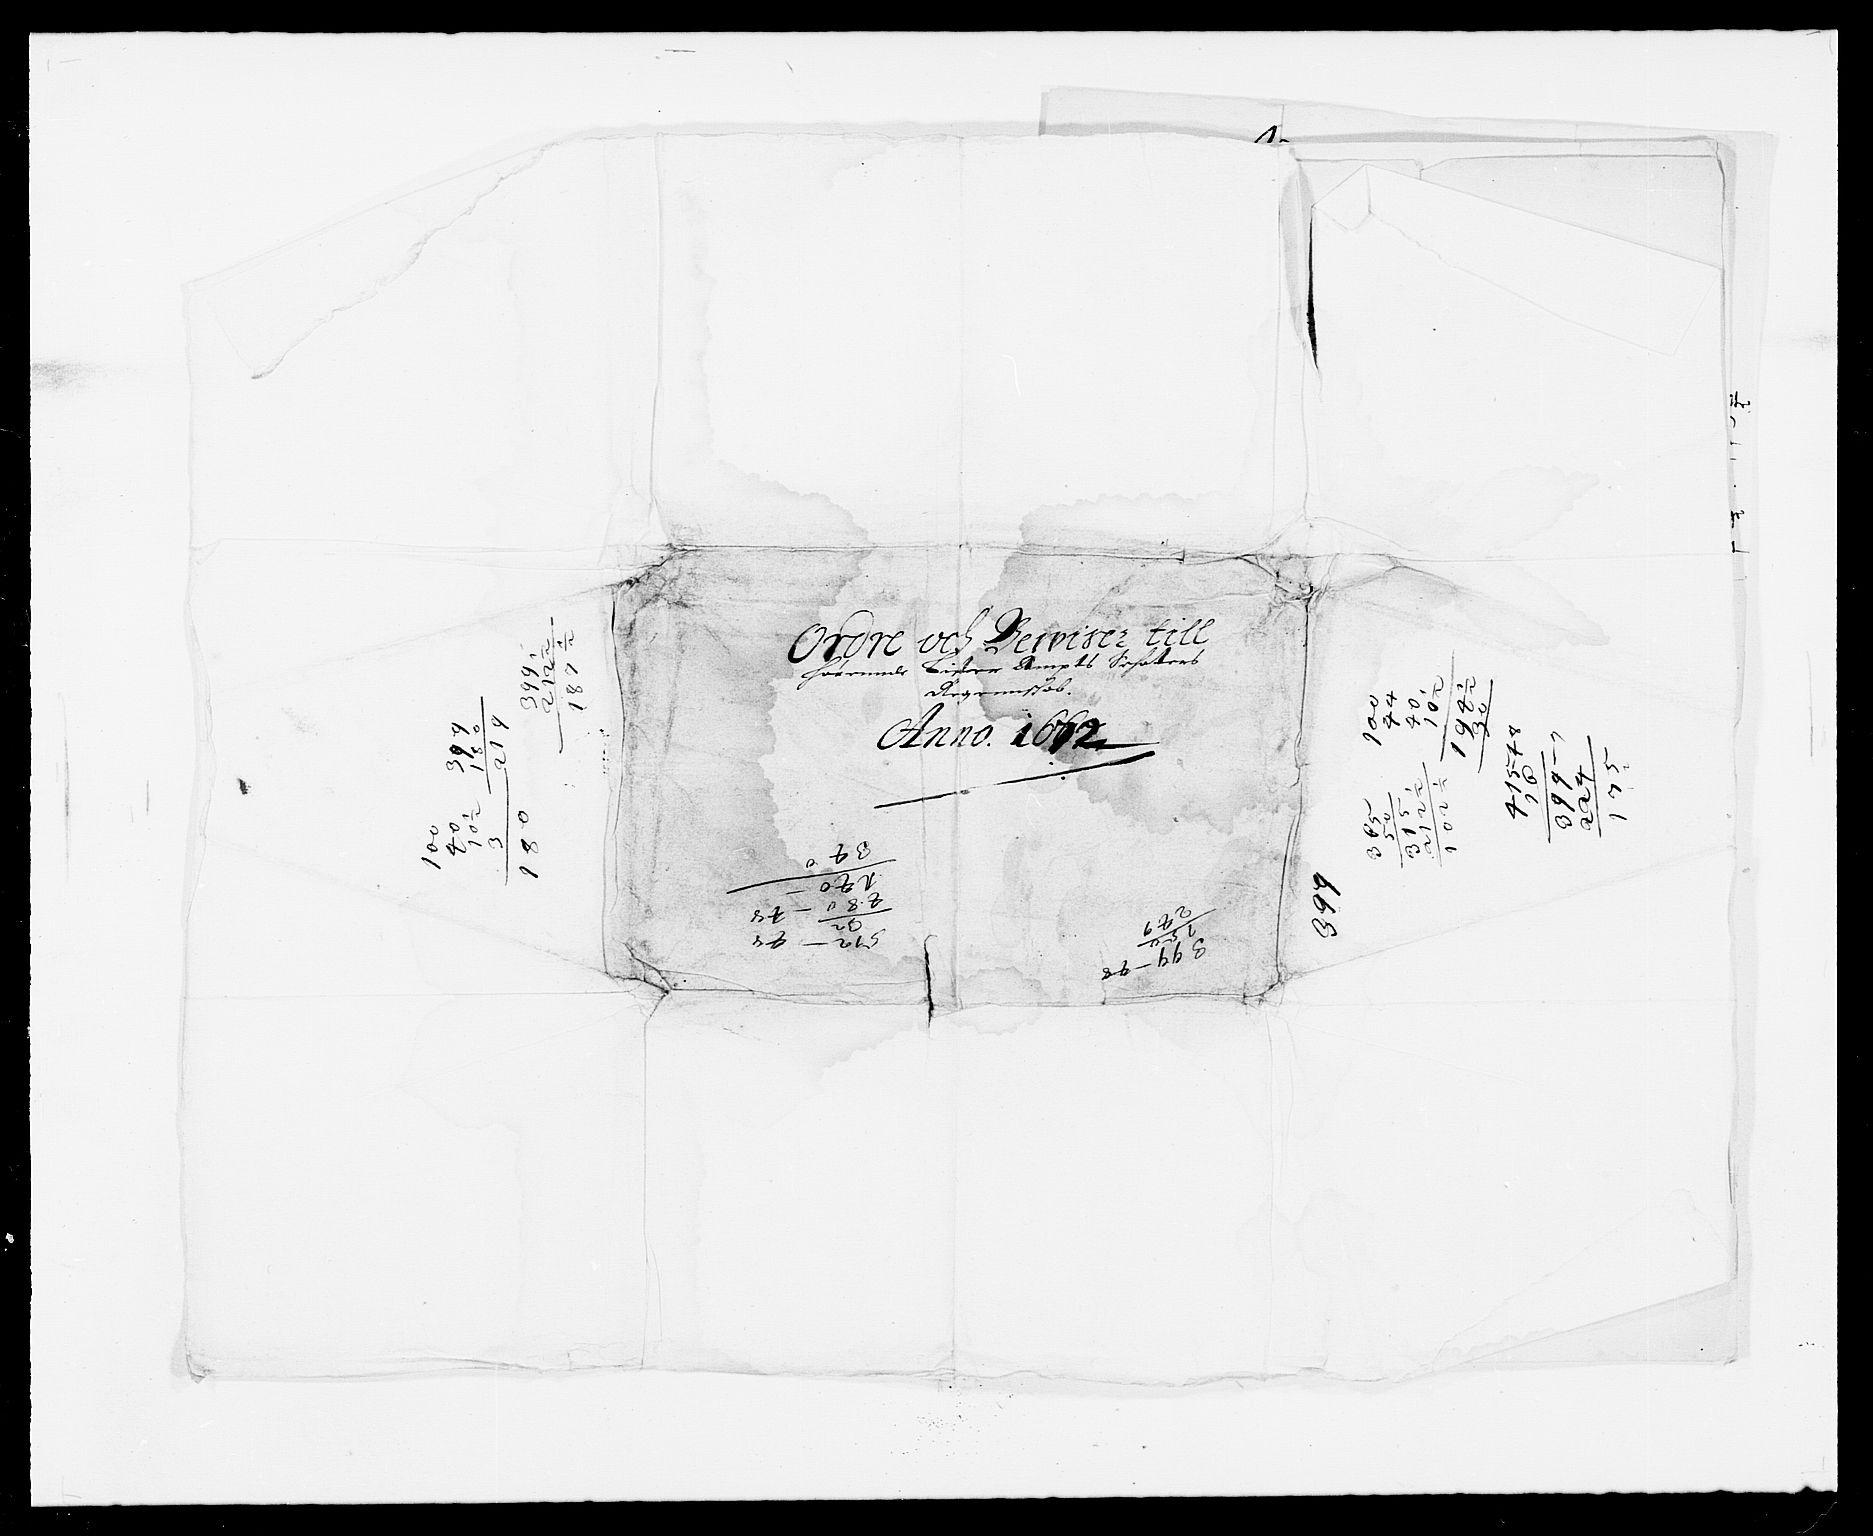 RA, Rentekammeret inntil 1814, Reviderte regnskaper, Fogderegnskap, R41/L2526: Fogderegnskap Lista, 1672, s. 149